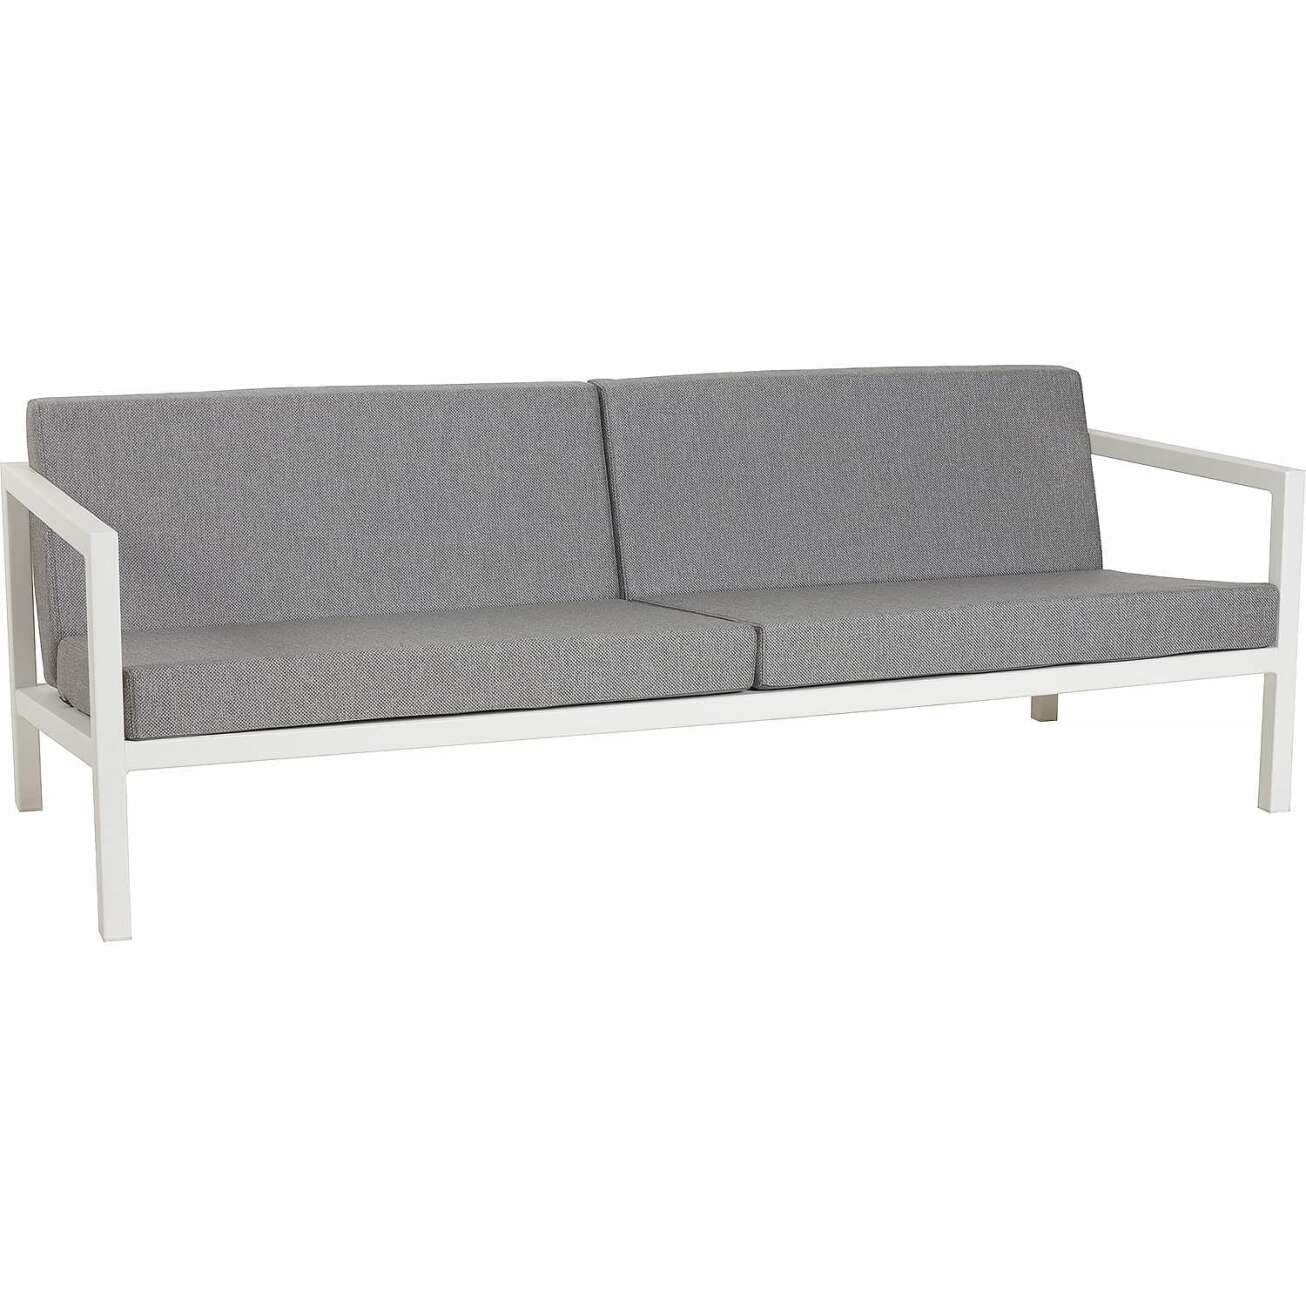 Sundays Frame 3-seter sofa i hvit aluminium med grå puter